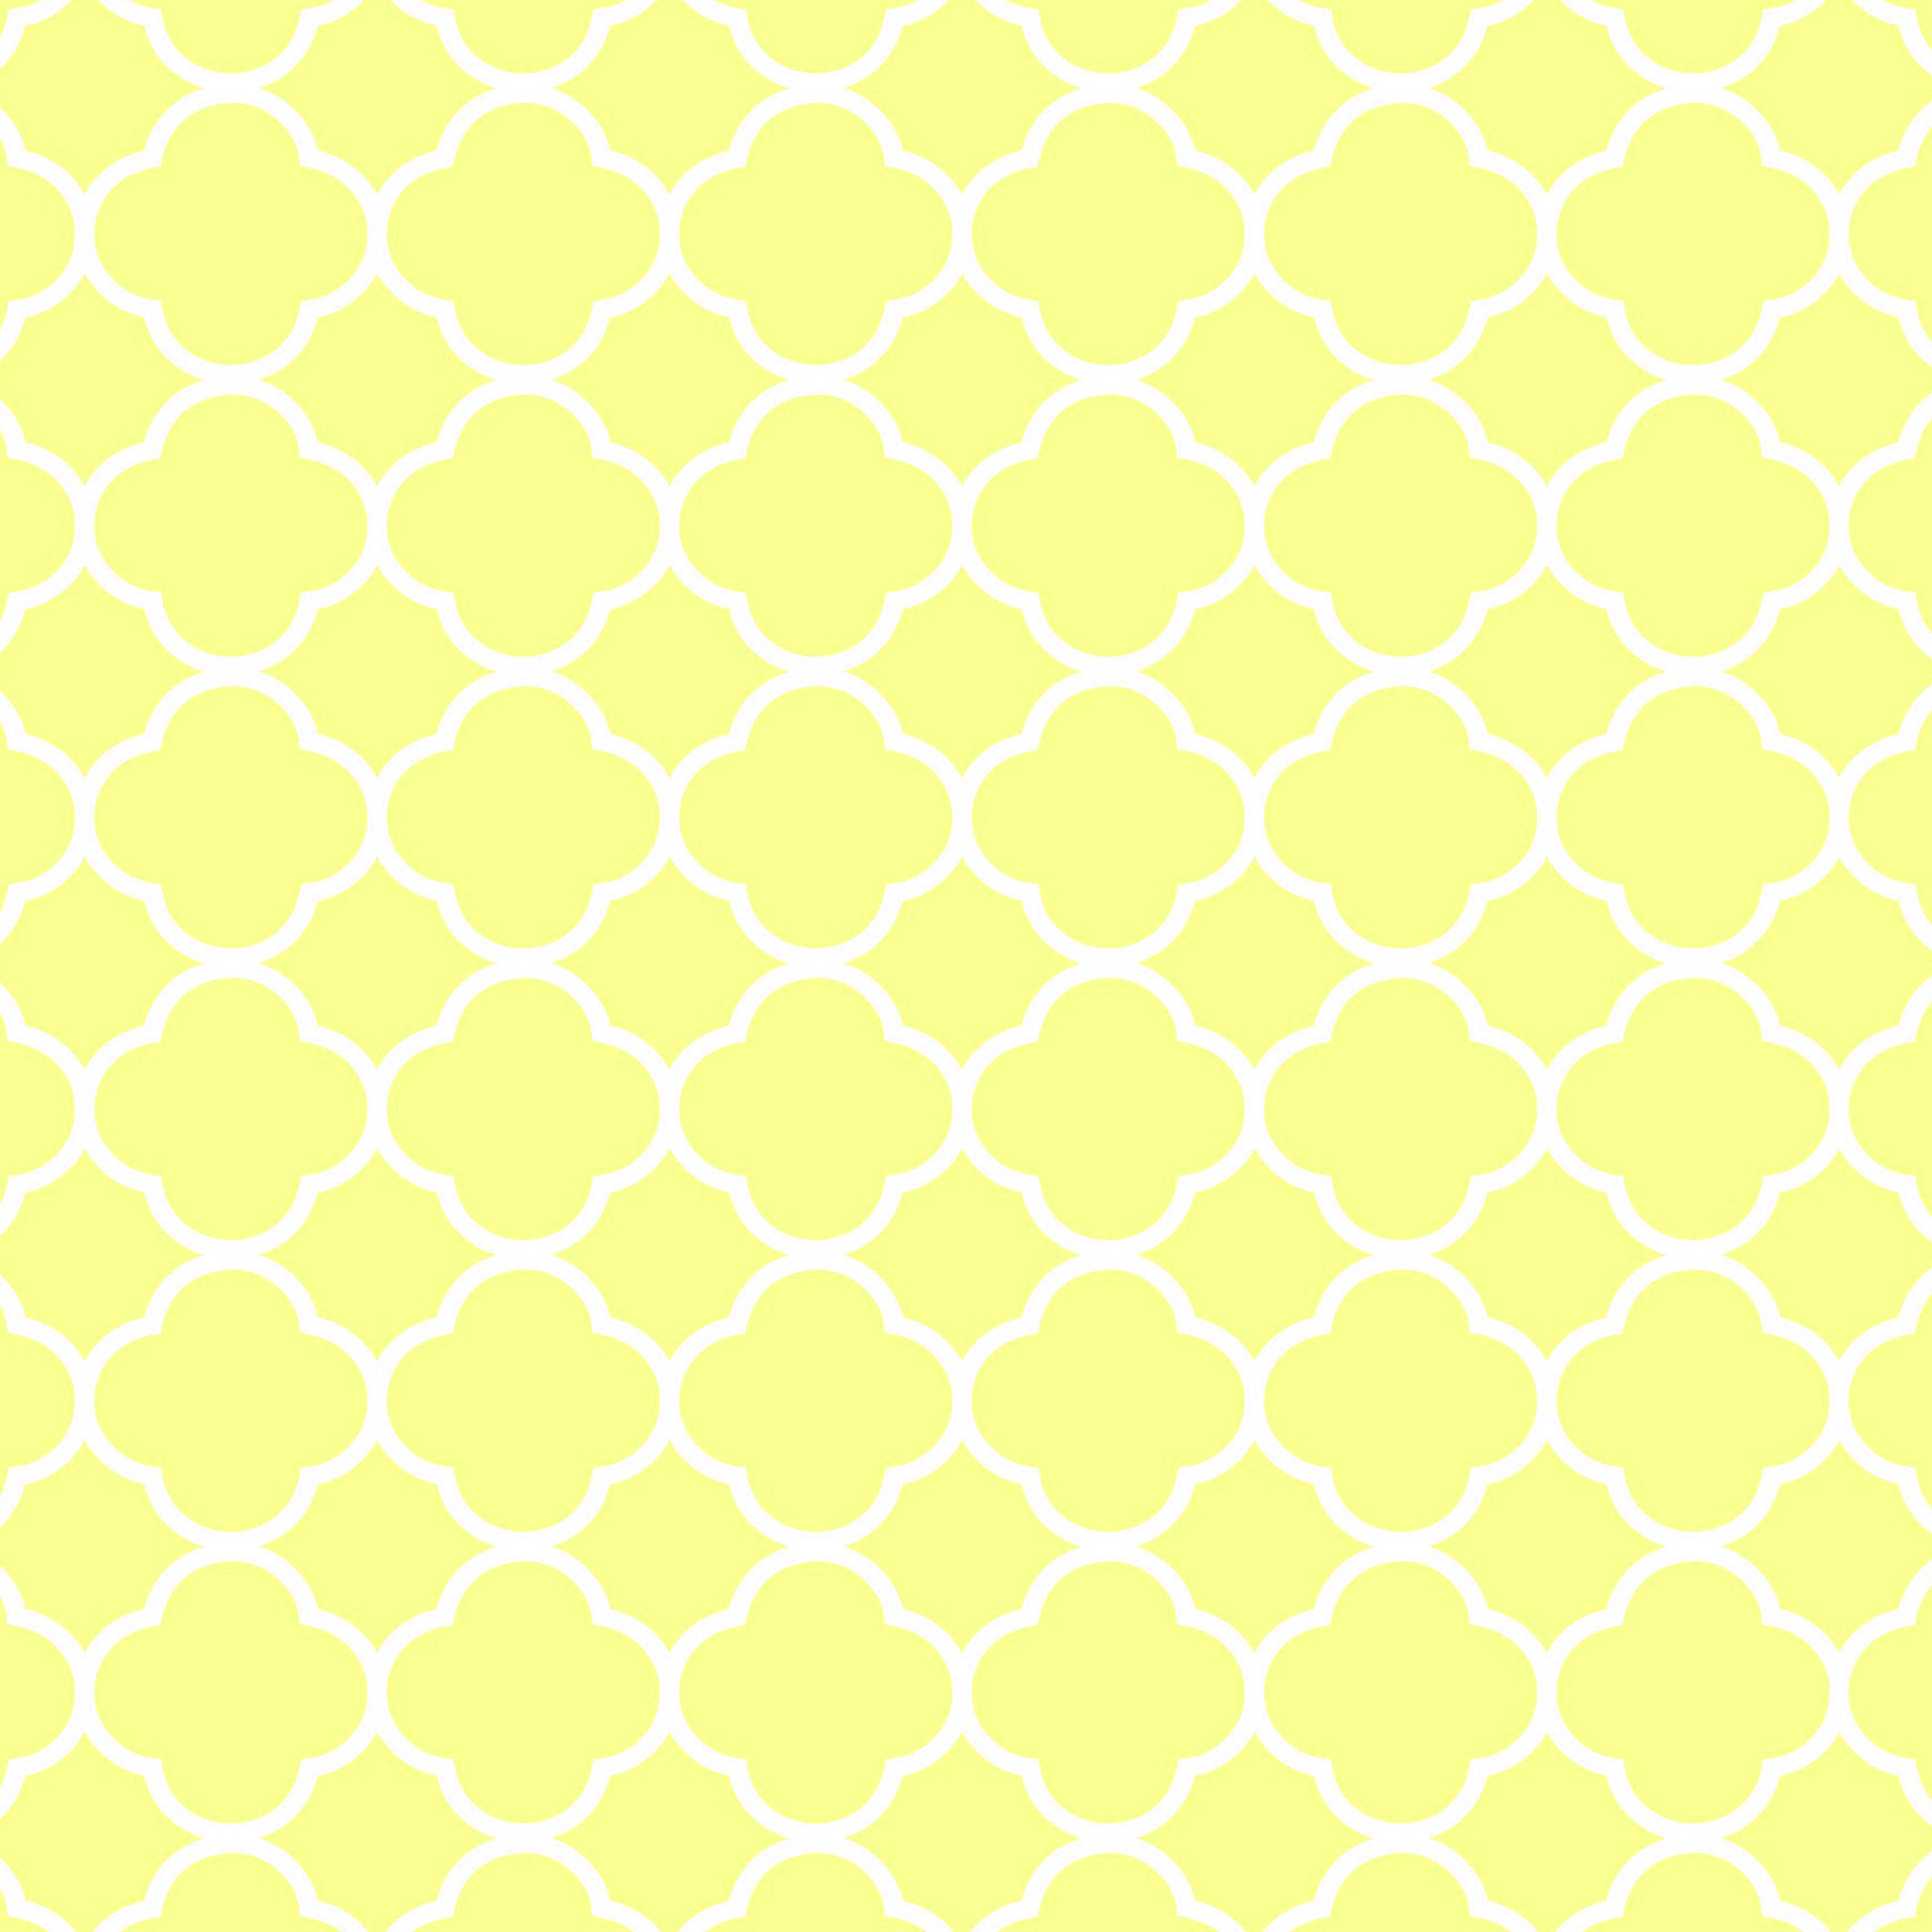 Geometric Digital Paper Seamless Pattern Pattern Paper Mosaic